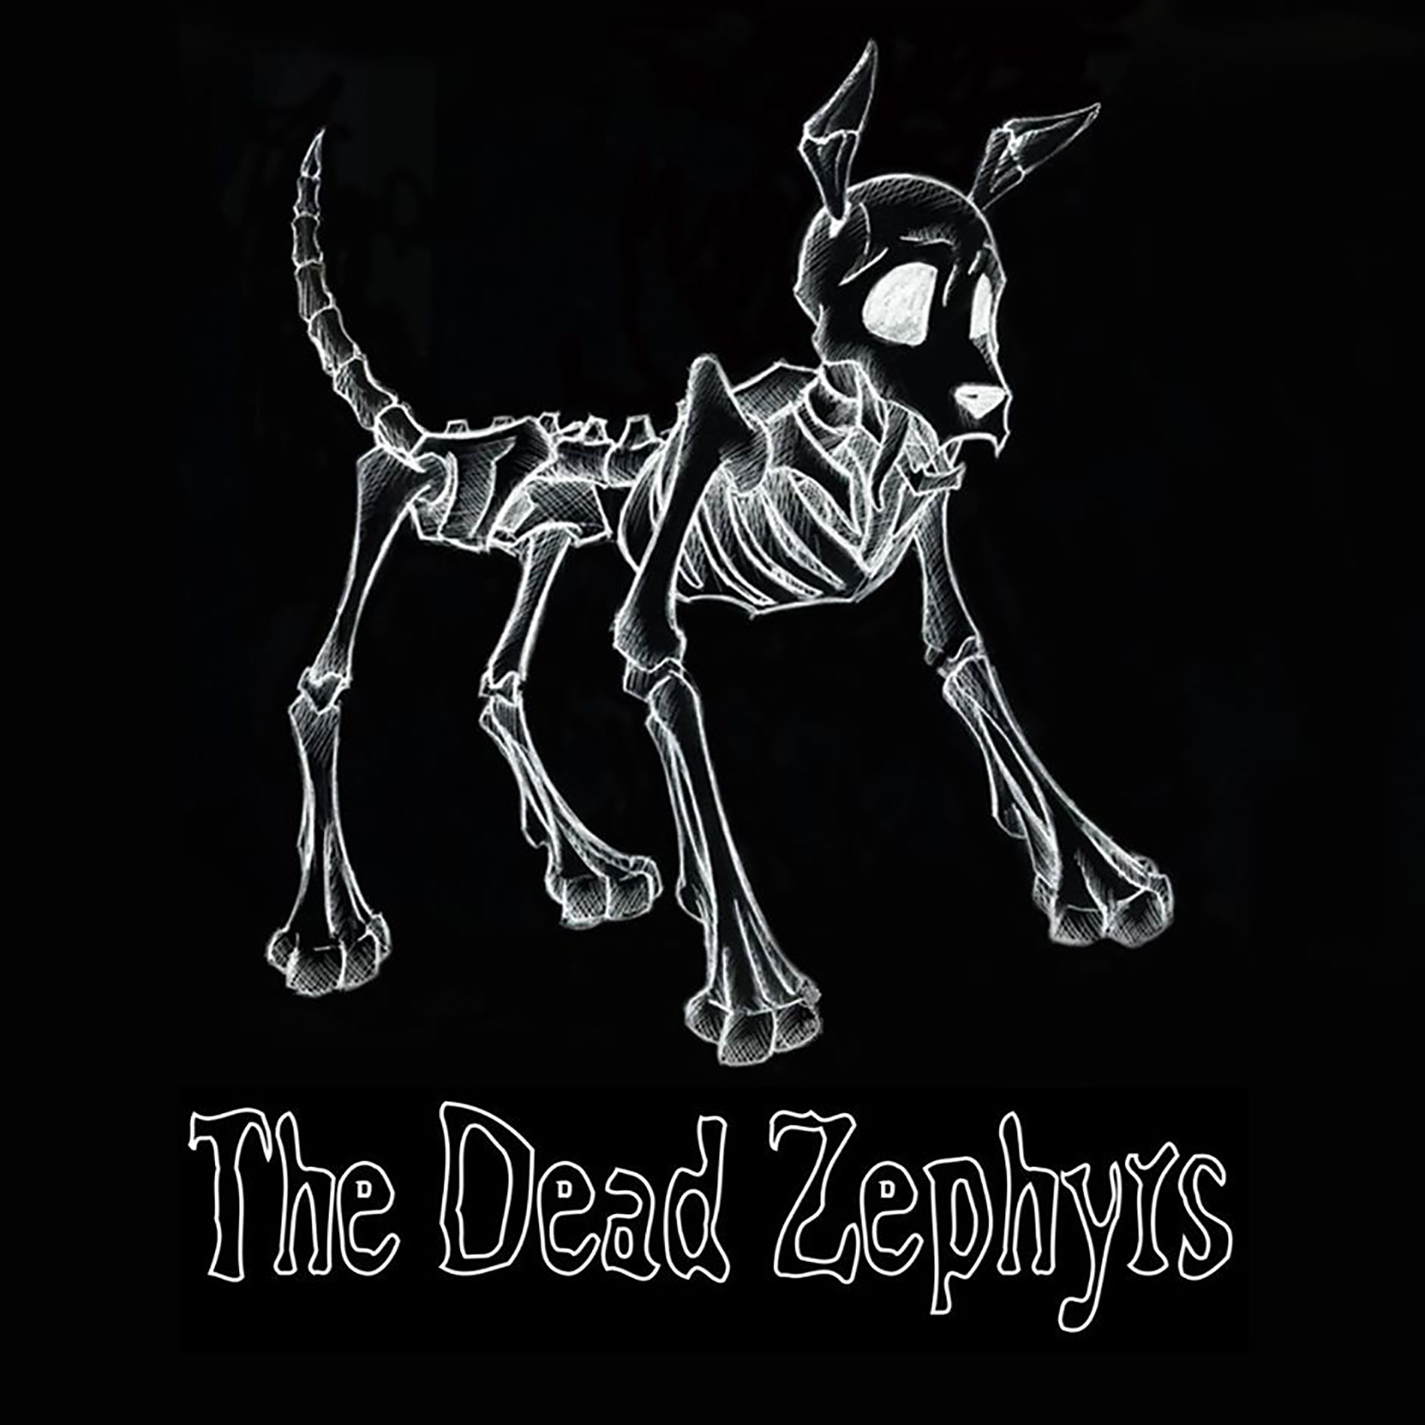 The Dead Zephyrs